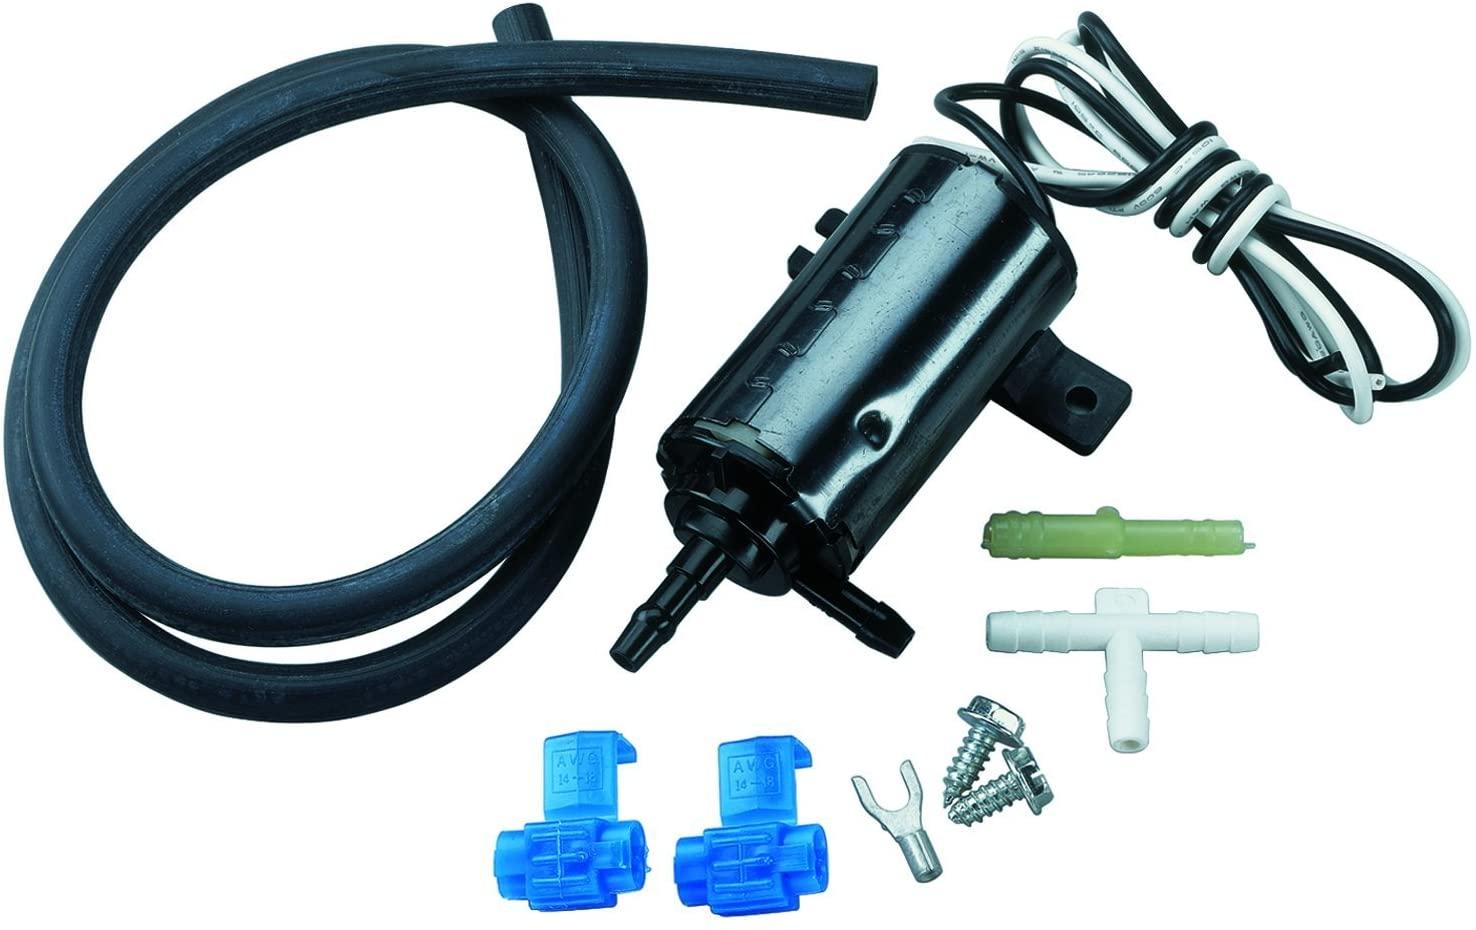 Trico 11-100 Spray Universal Windshield Washer Pump-Pack of 1